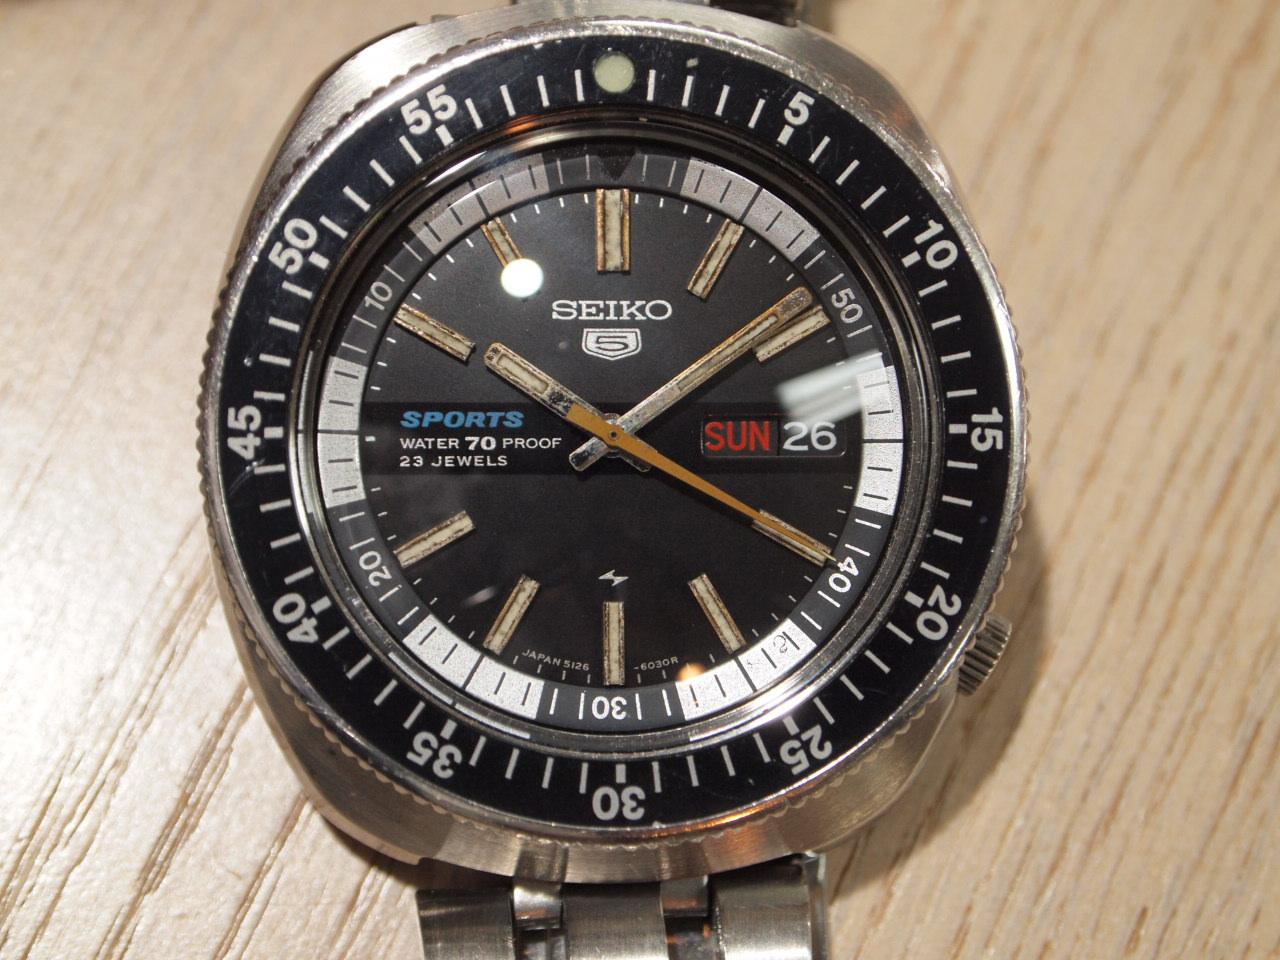 3d68faee7 Yutakaya: SEIKO SEIKO5Sports 5216-6030 Self-winding watch | Rakuten ...